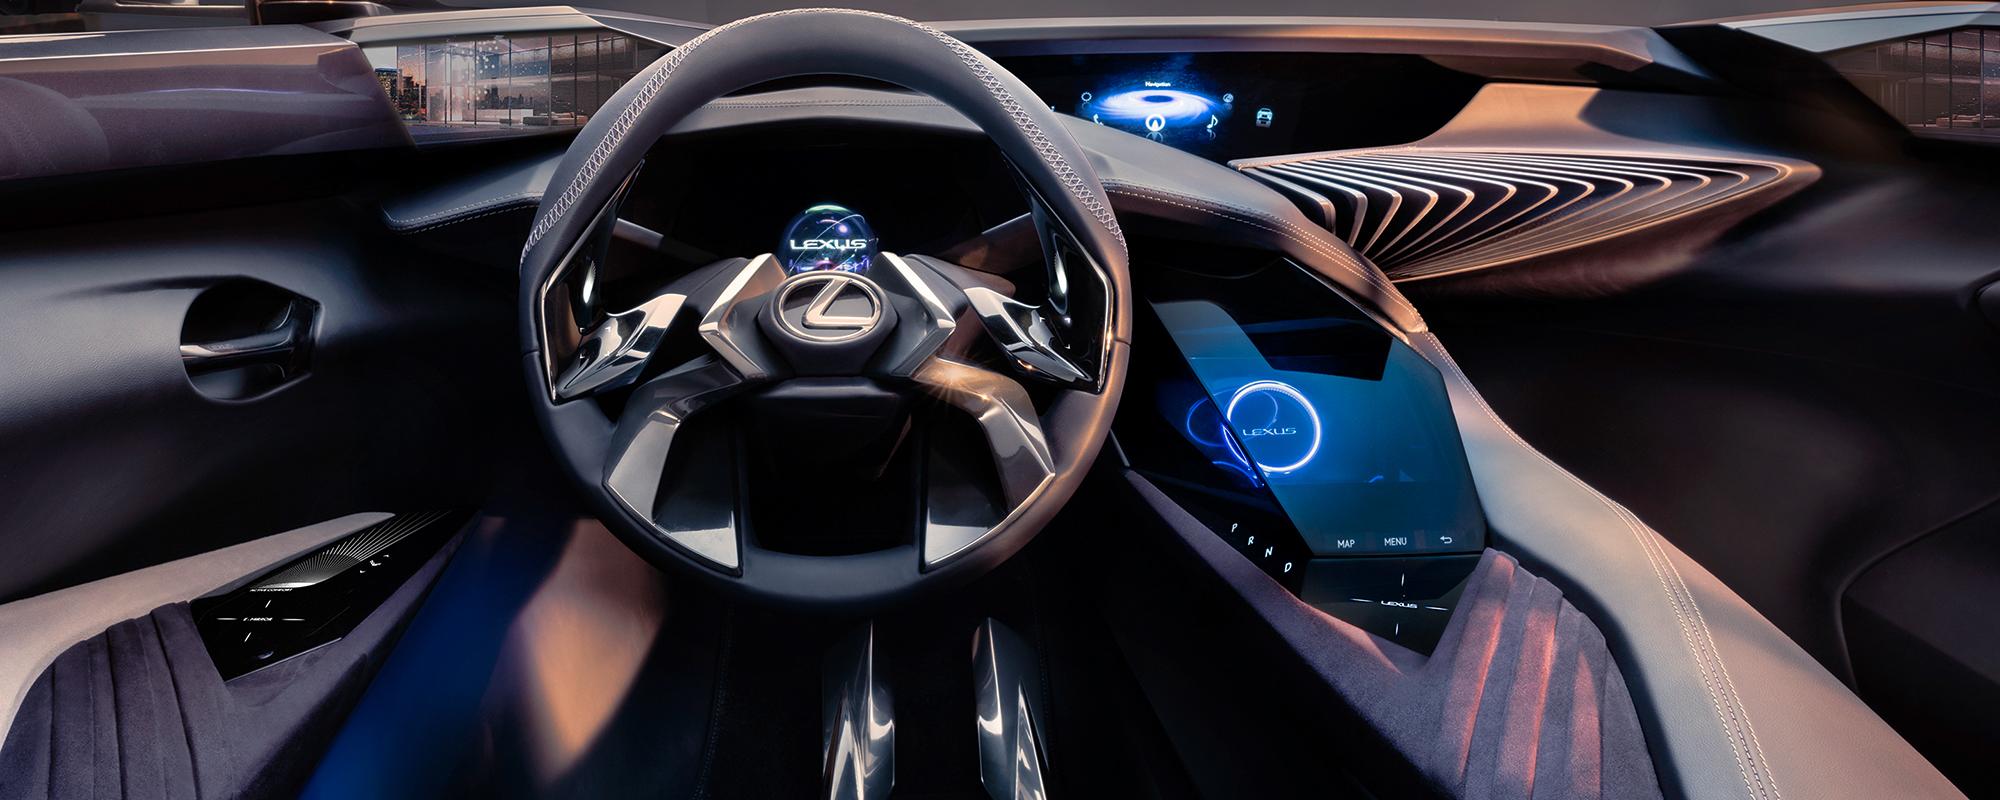 Lexus UX Concept biedt sensationele technologie met 3D-Human Machine Interface